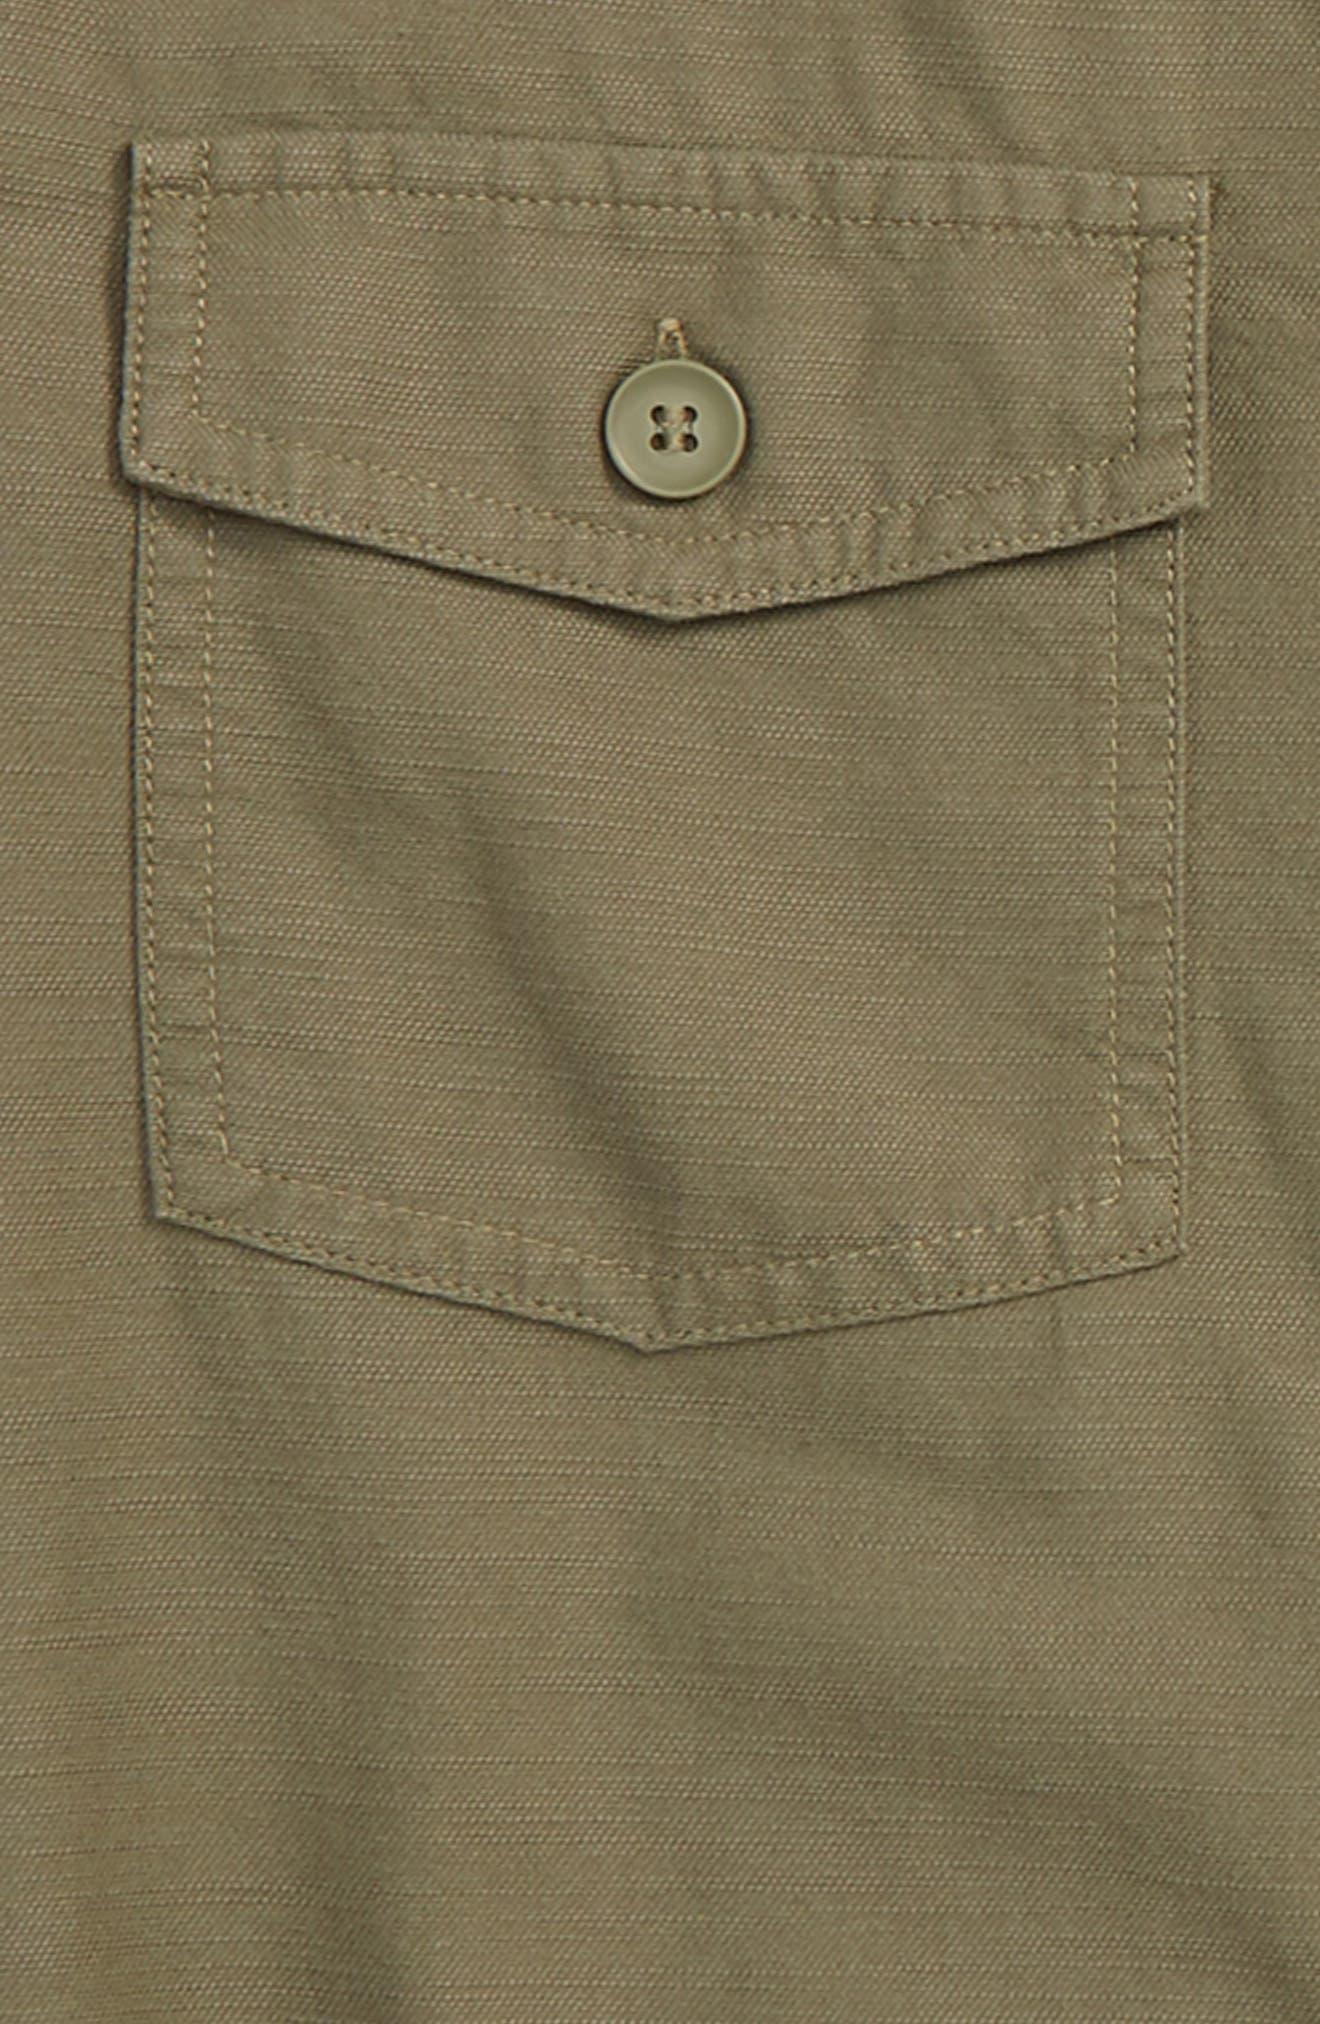 TREASURE & BOND,                             Utility Shirt,                             Alternate thumbnail 2, color,                             311